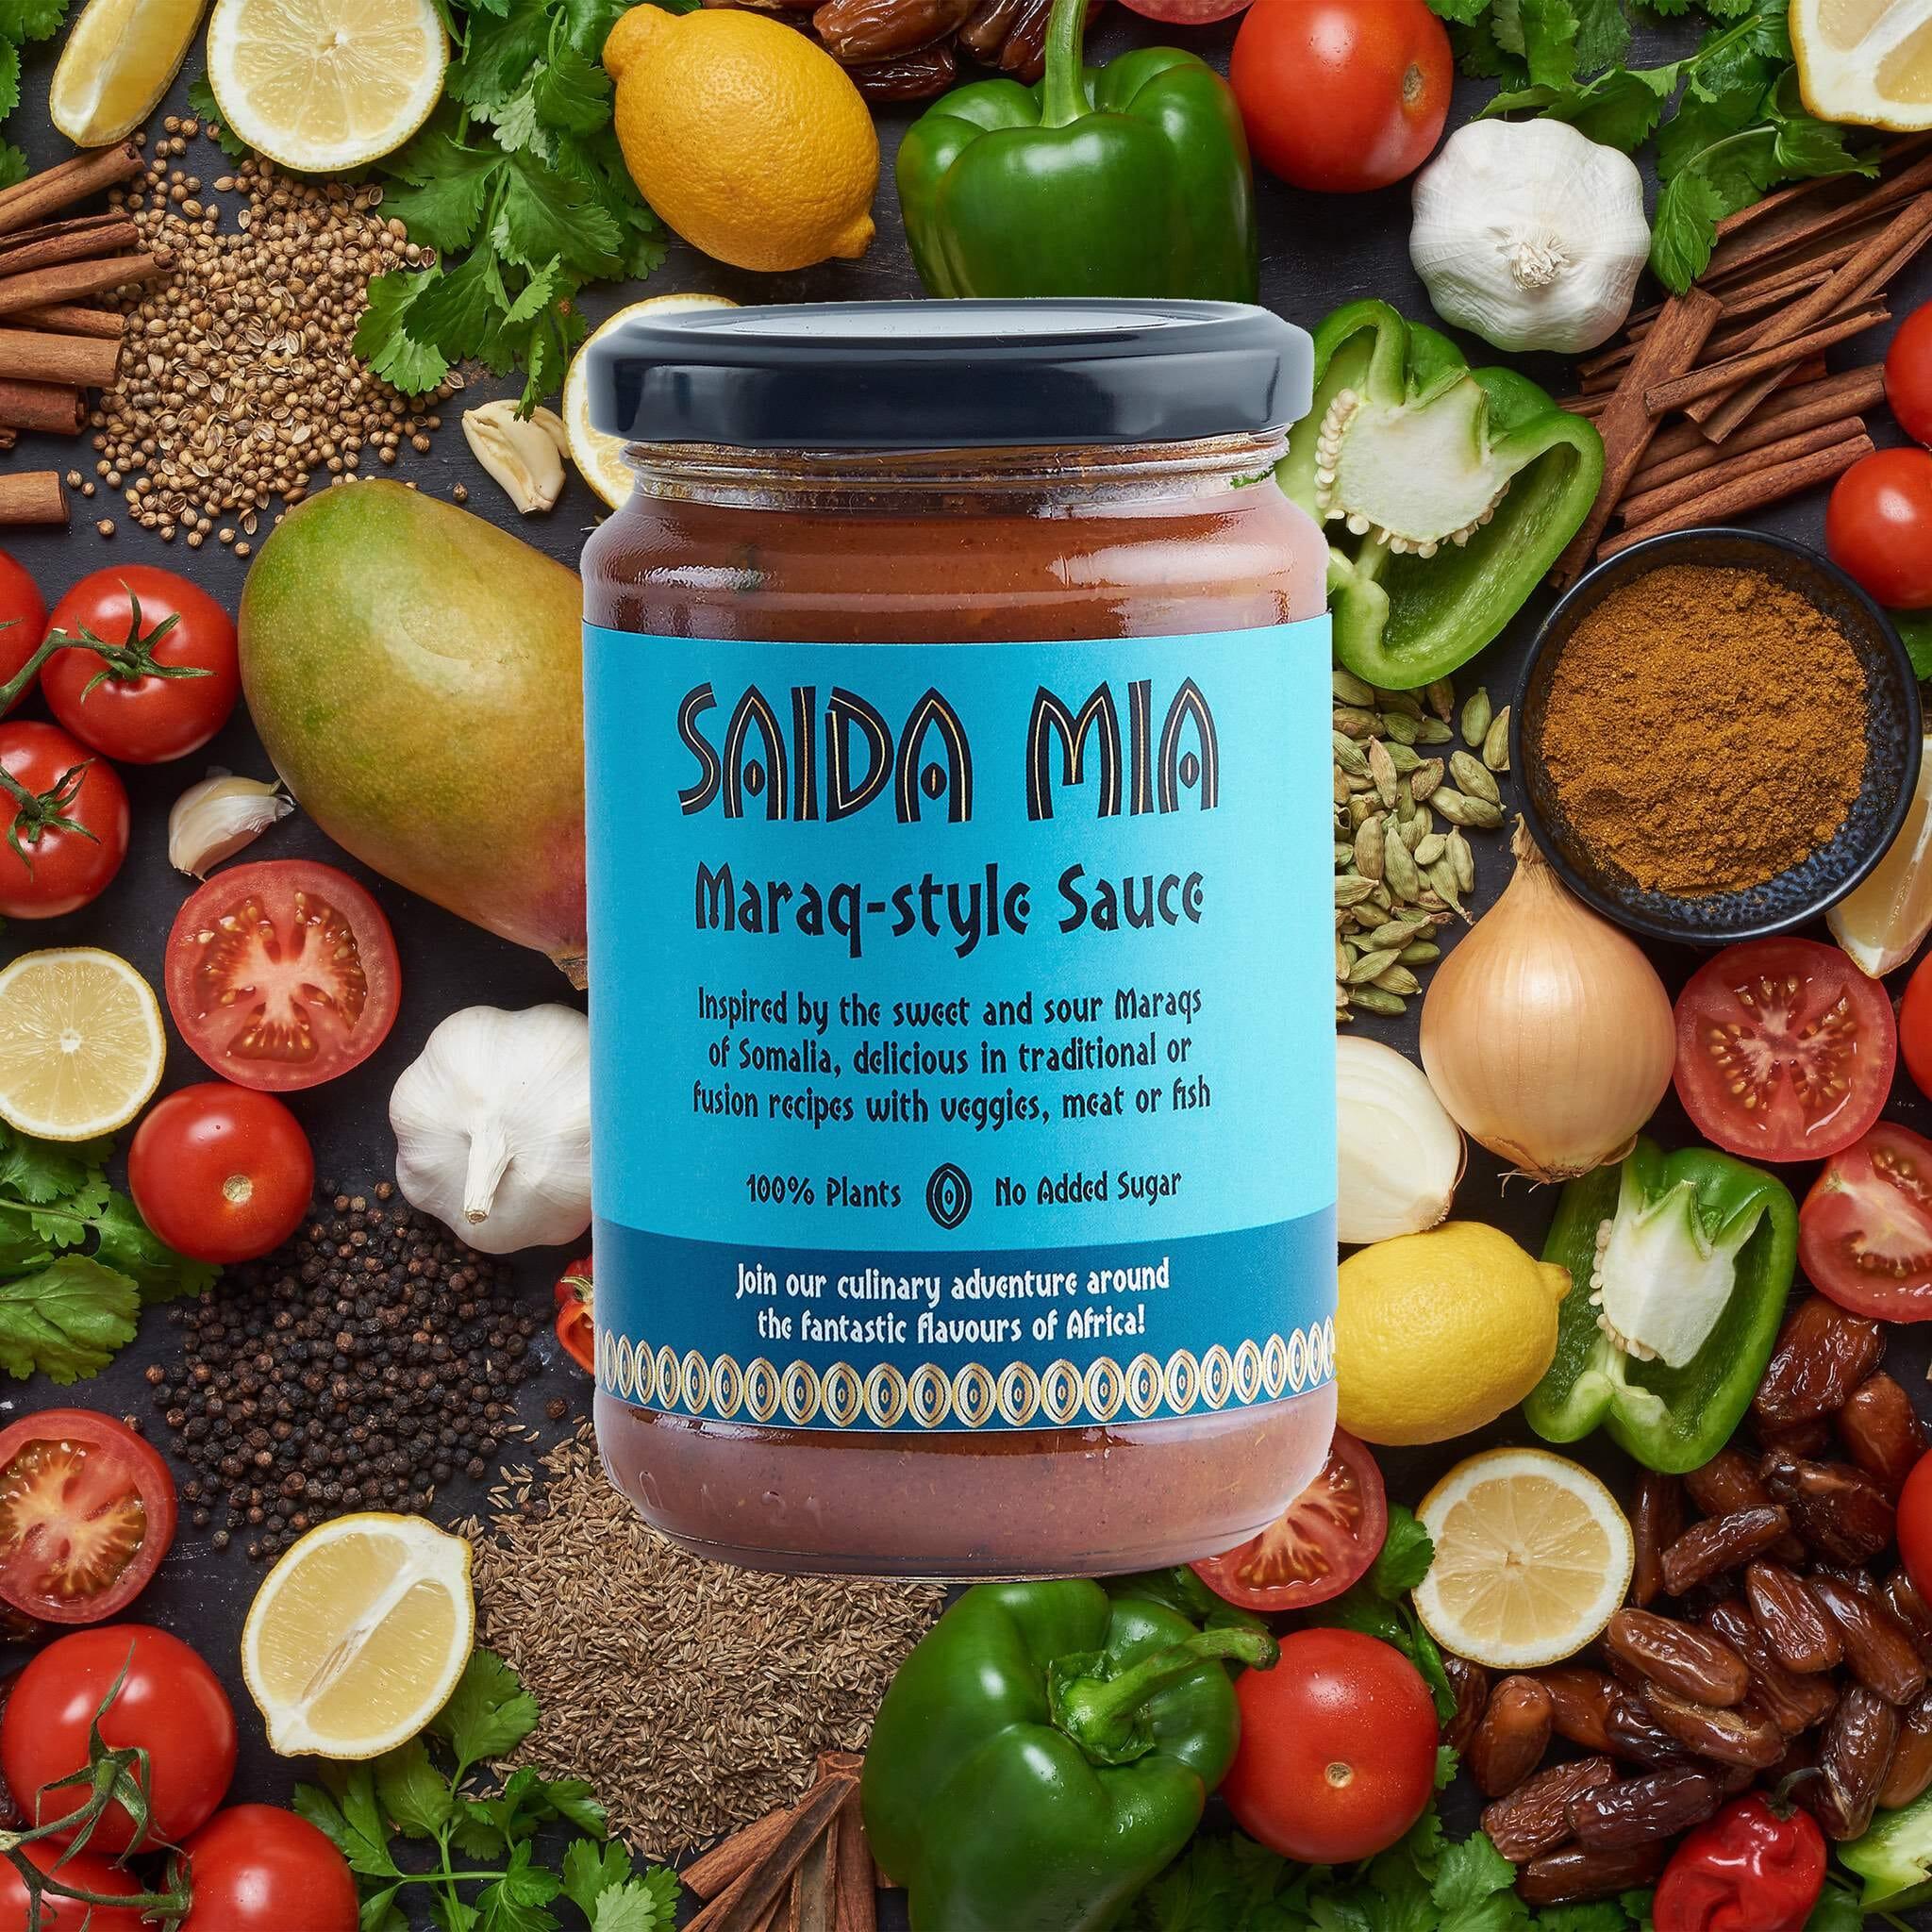 Saida Mia African Products Maraq Sauce Pack Ingredients Image